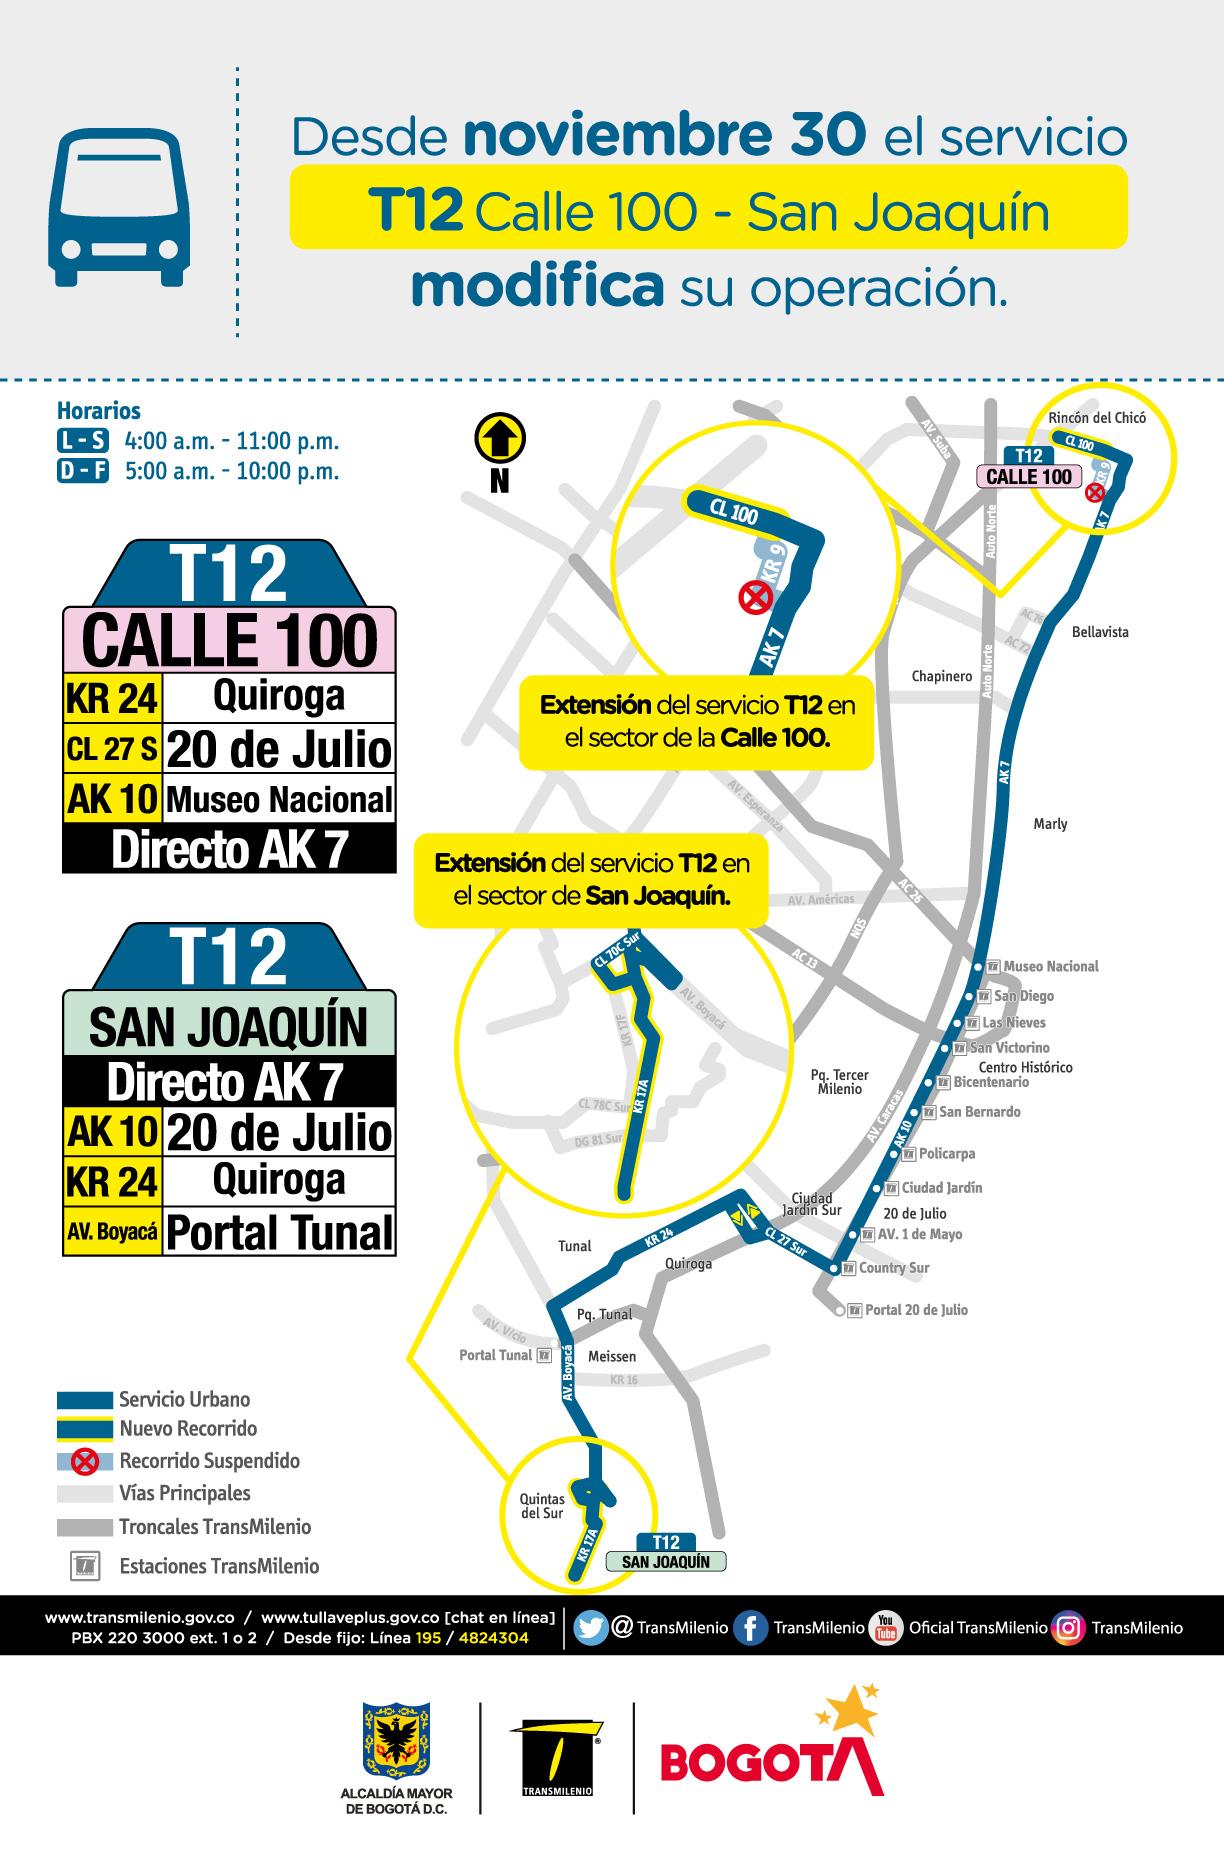 T12 Calle 100 - San Joaquin